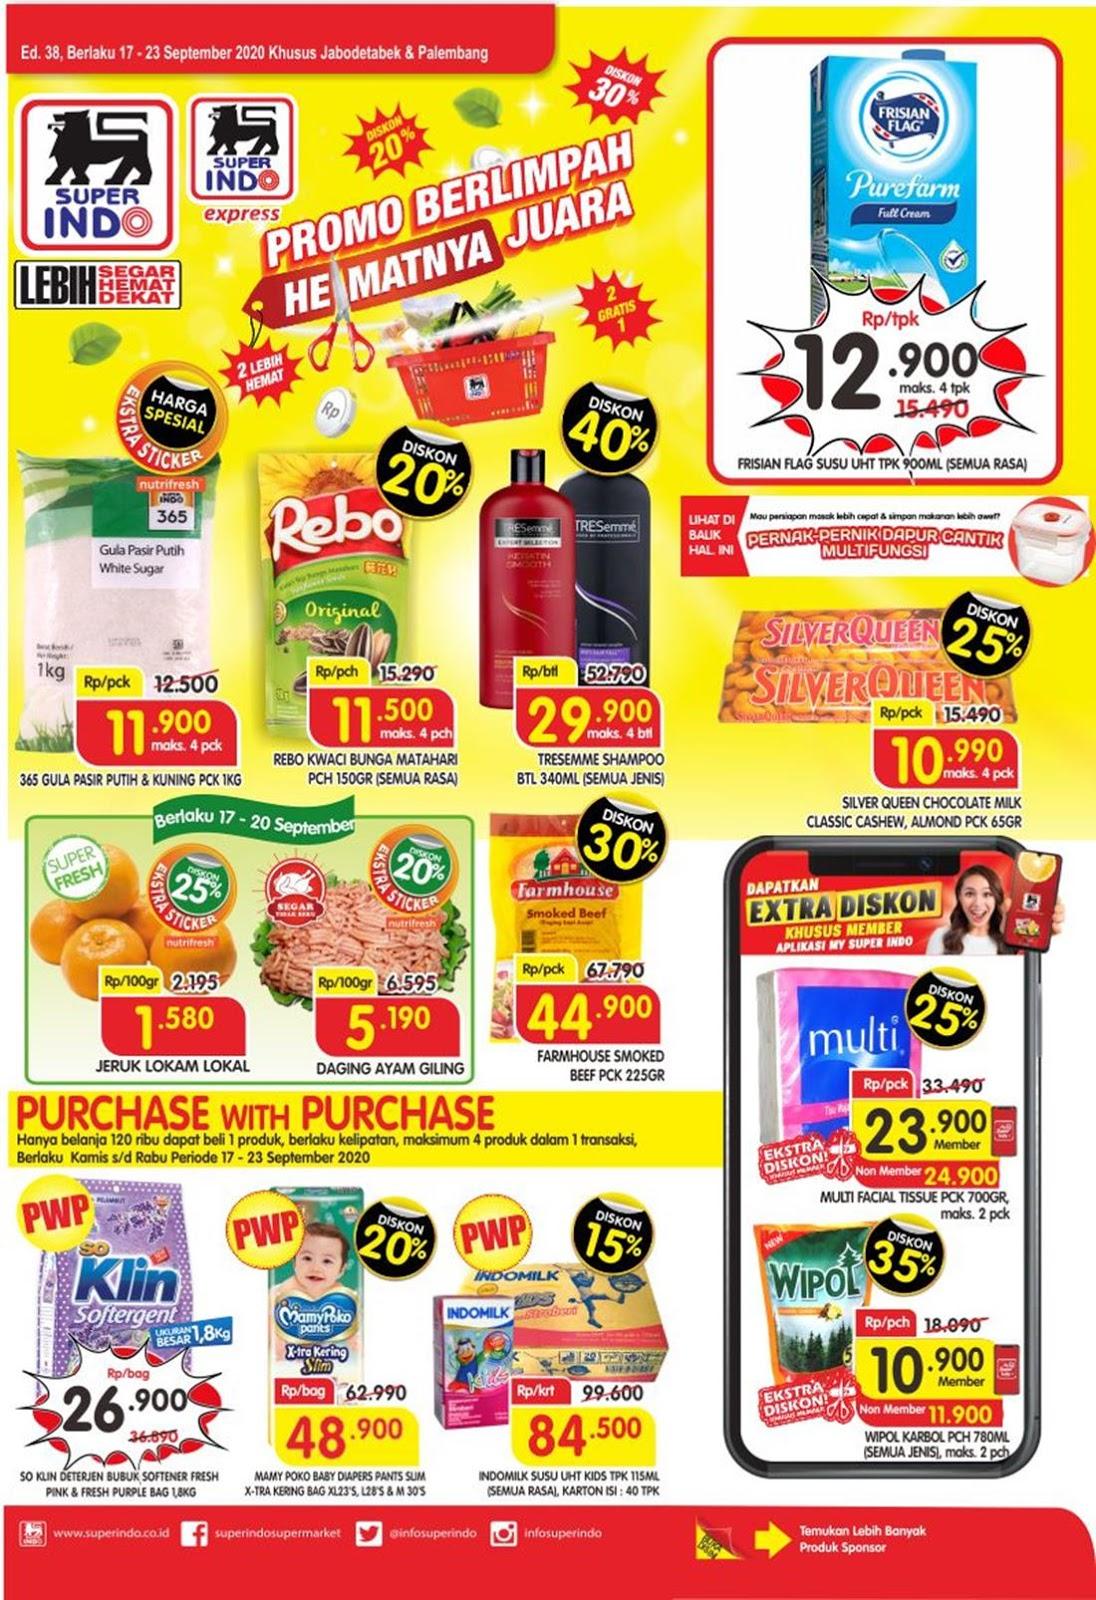 Katalog Superindo Promo Superindo Mingguan 17 23 September 2020 Harga Diskon